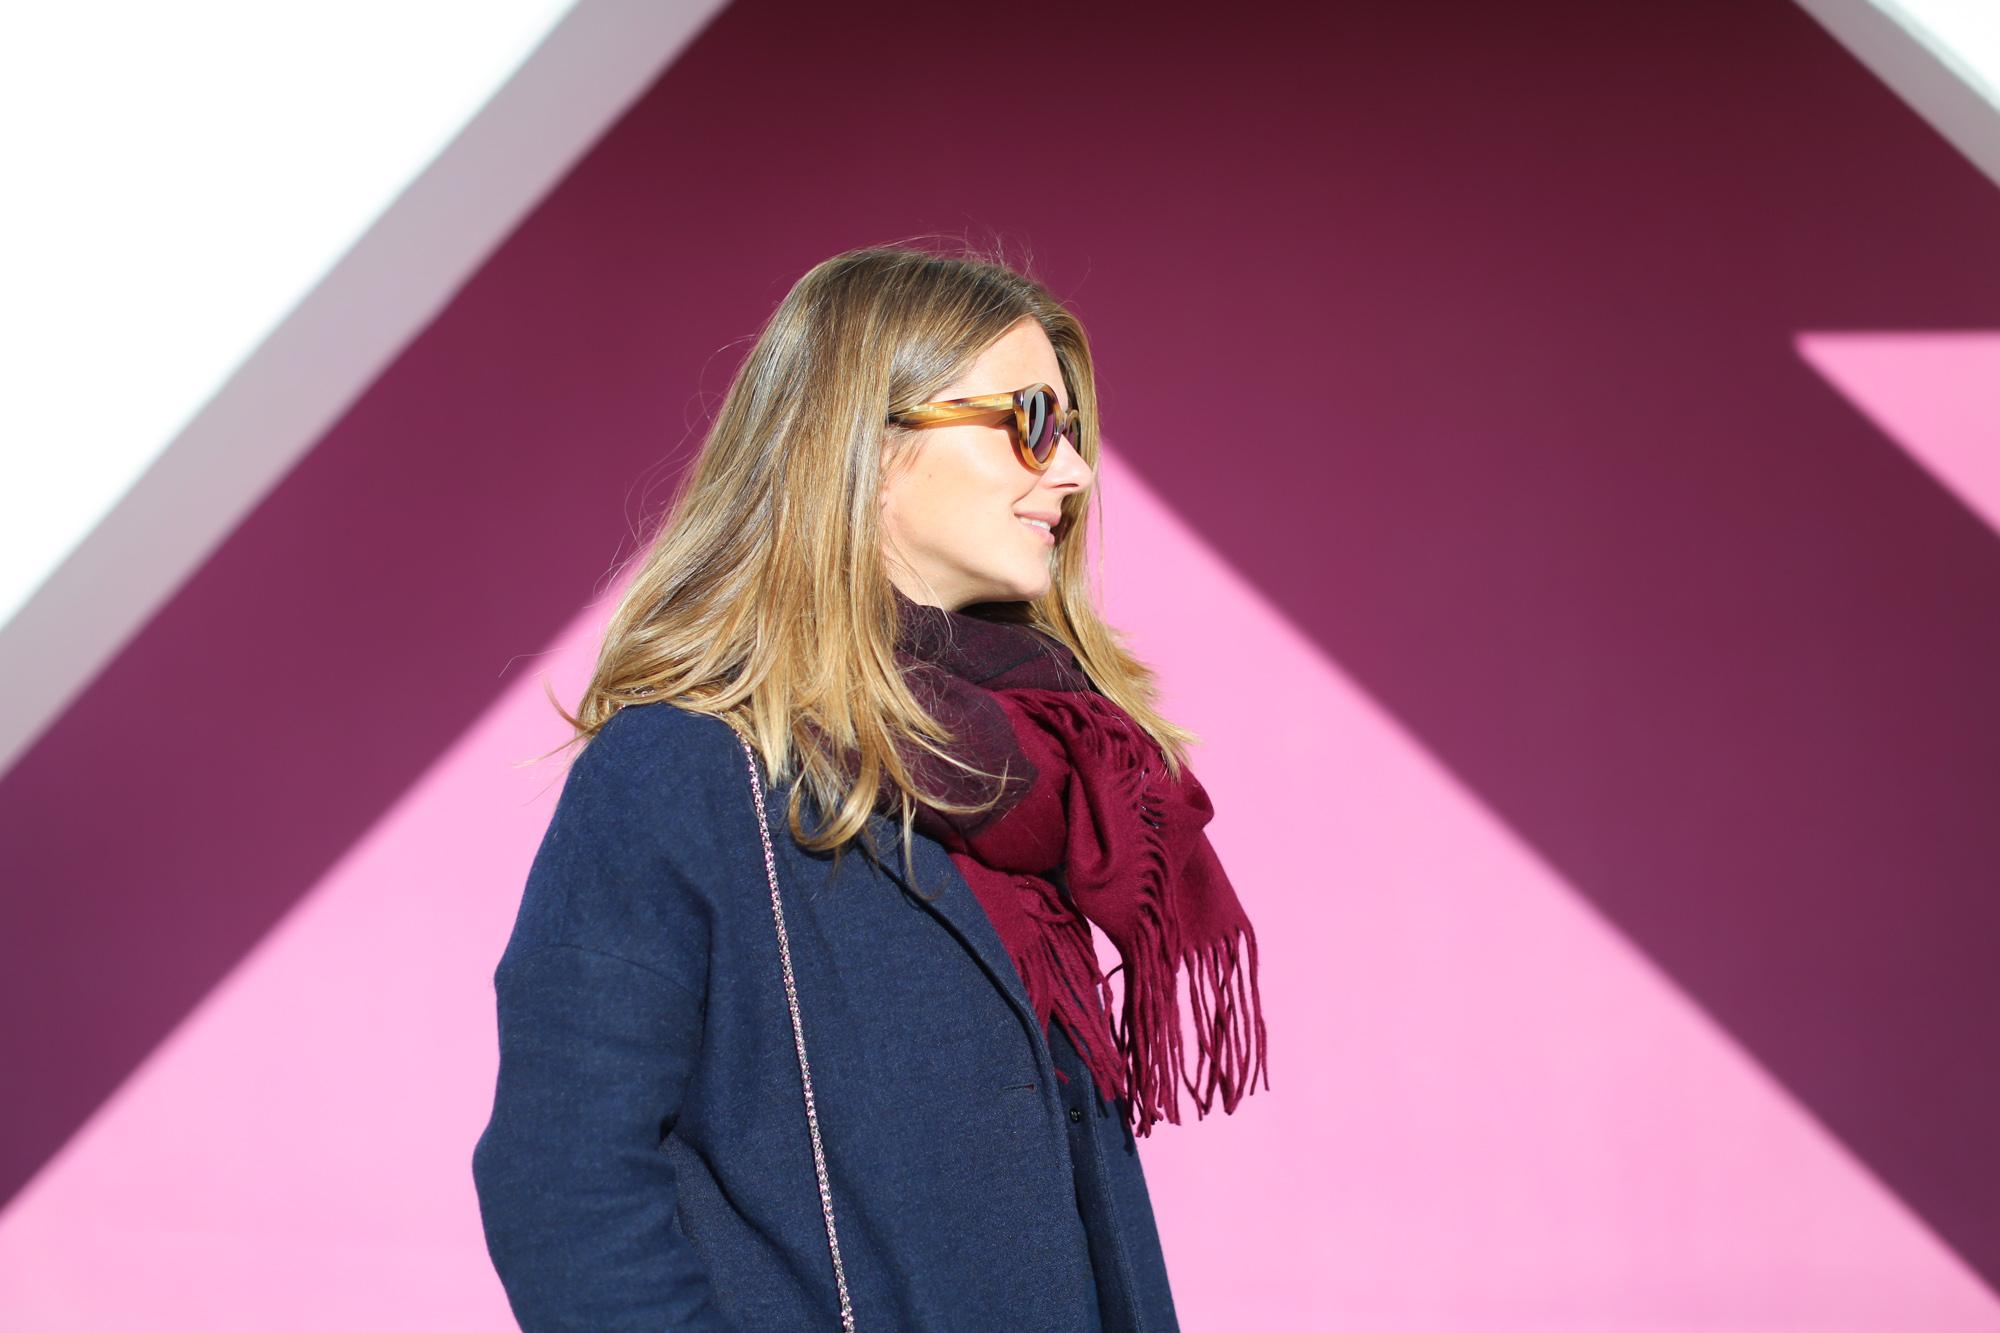 Clochet_fashionblogger_streetstyle_&otherstories_stilettoankleboots_burgundyheroscarf_metallicflowerssweater_titamadridspiga-4